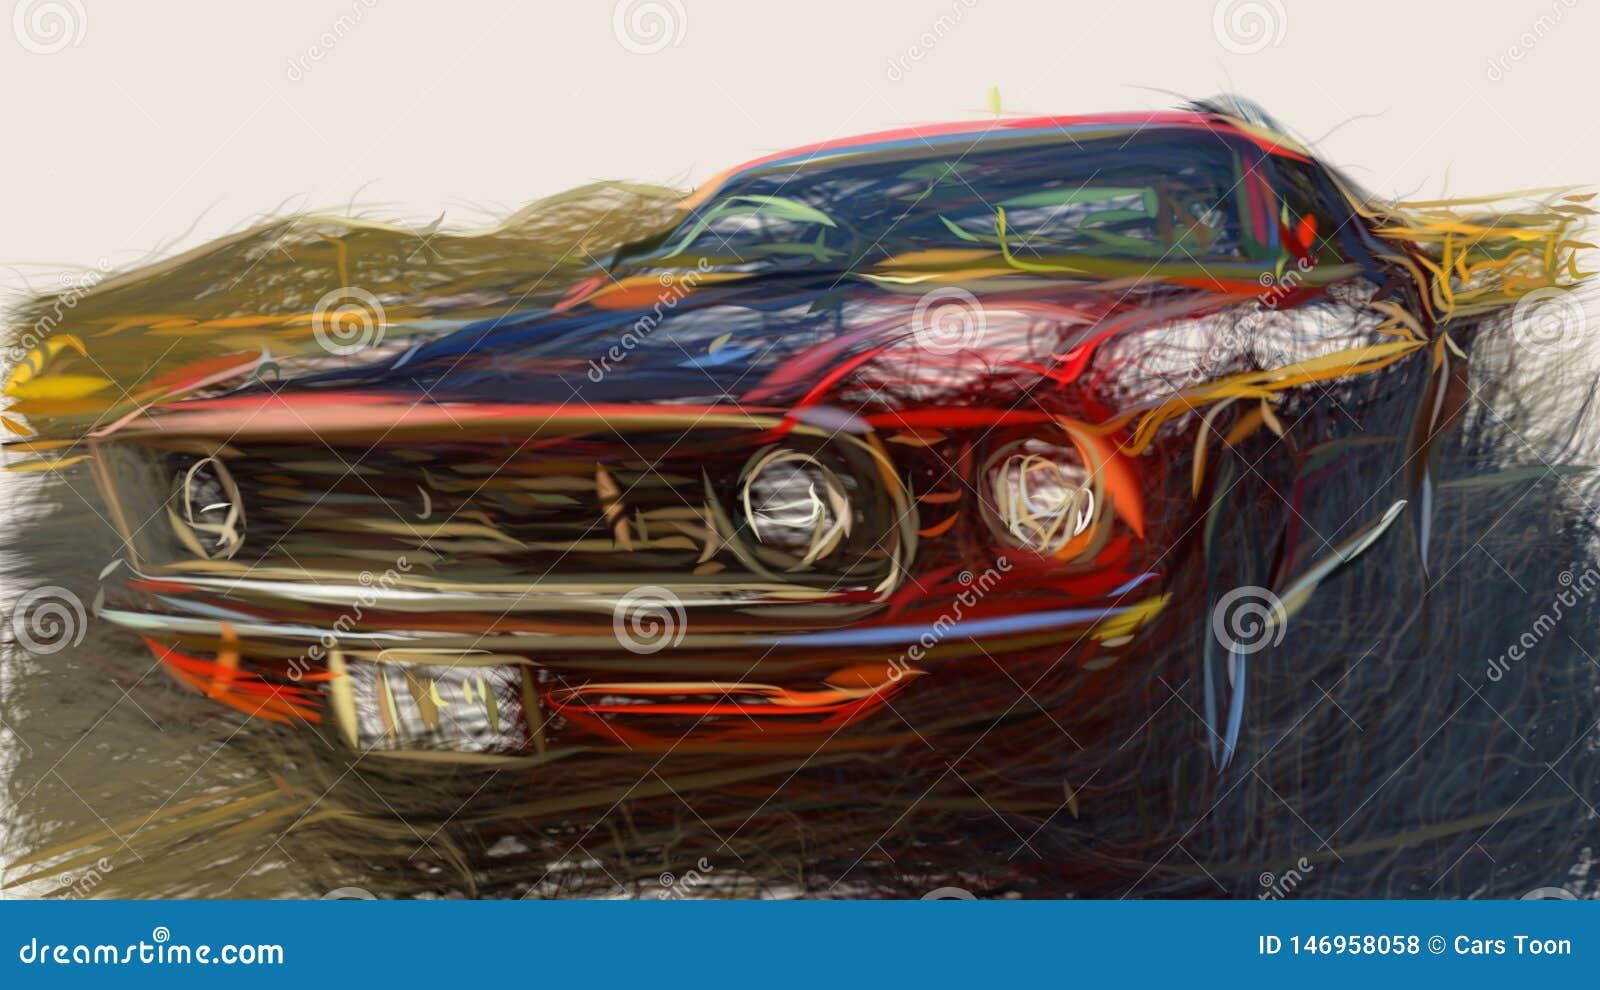 1969 Ford Mustang 428 Super Cobra Jet ID 664 Stock